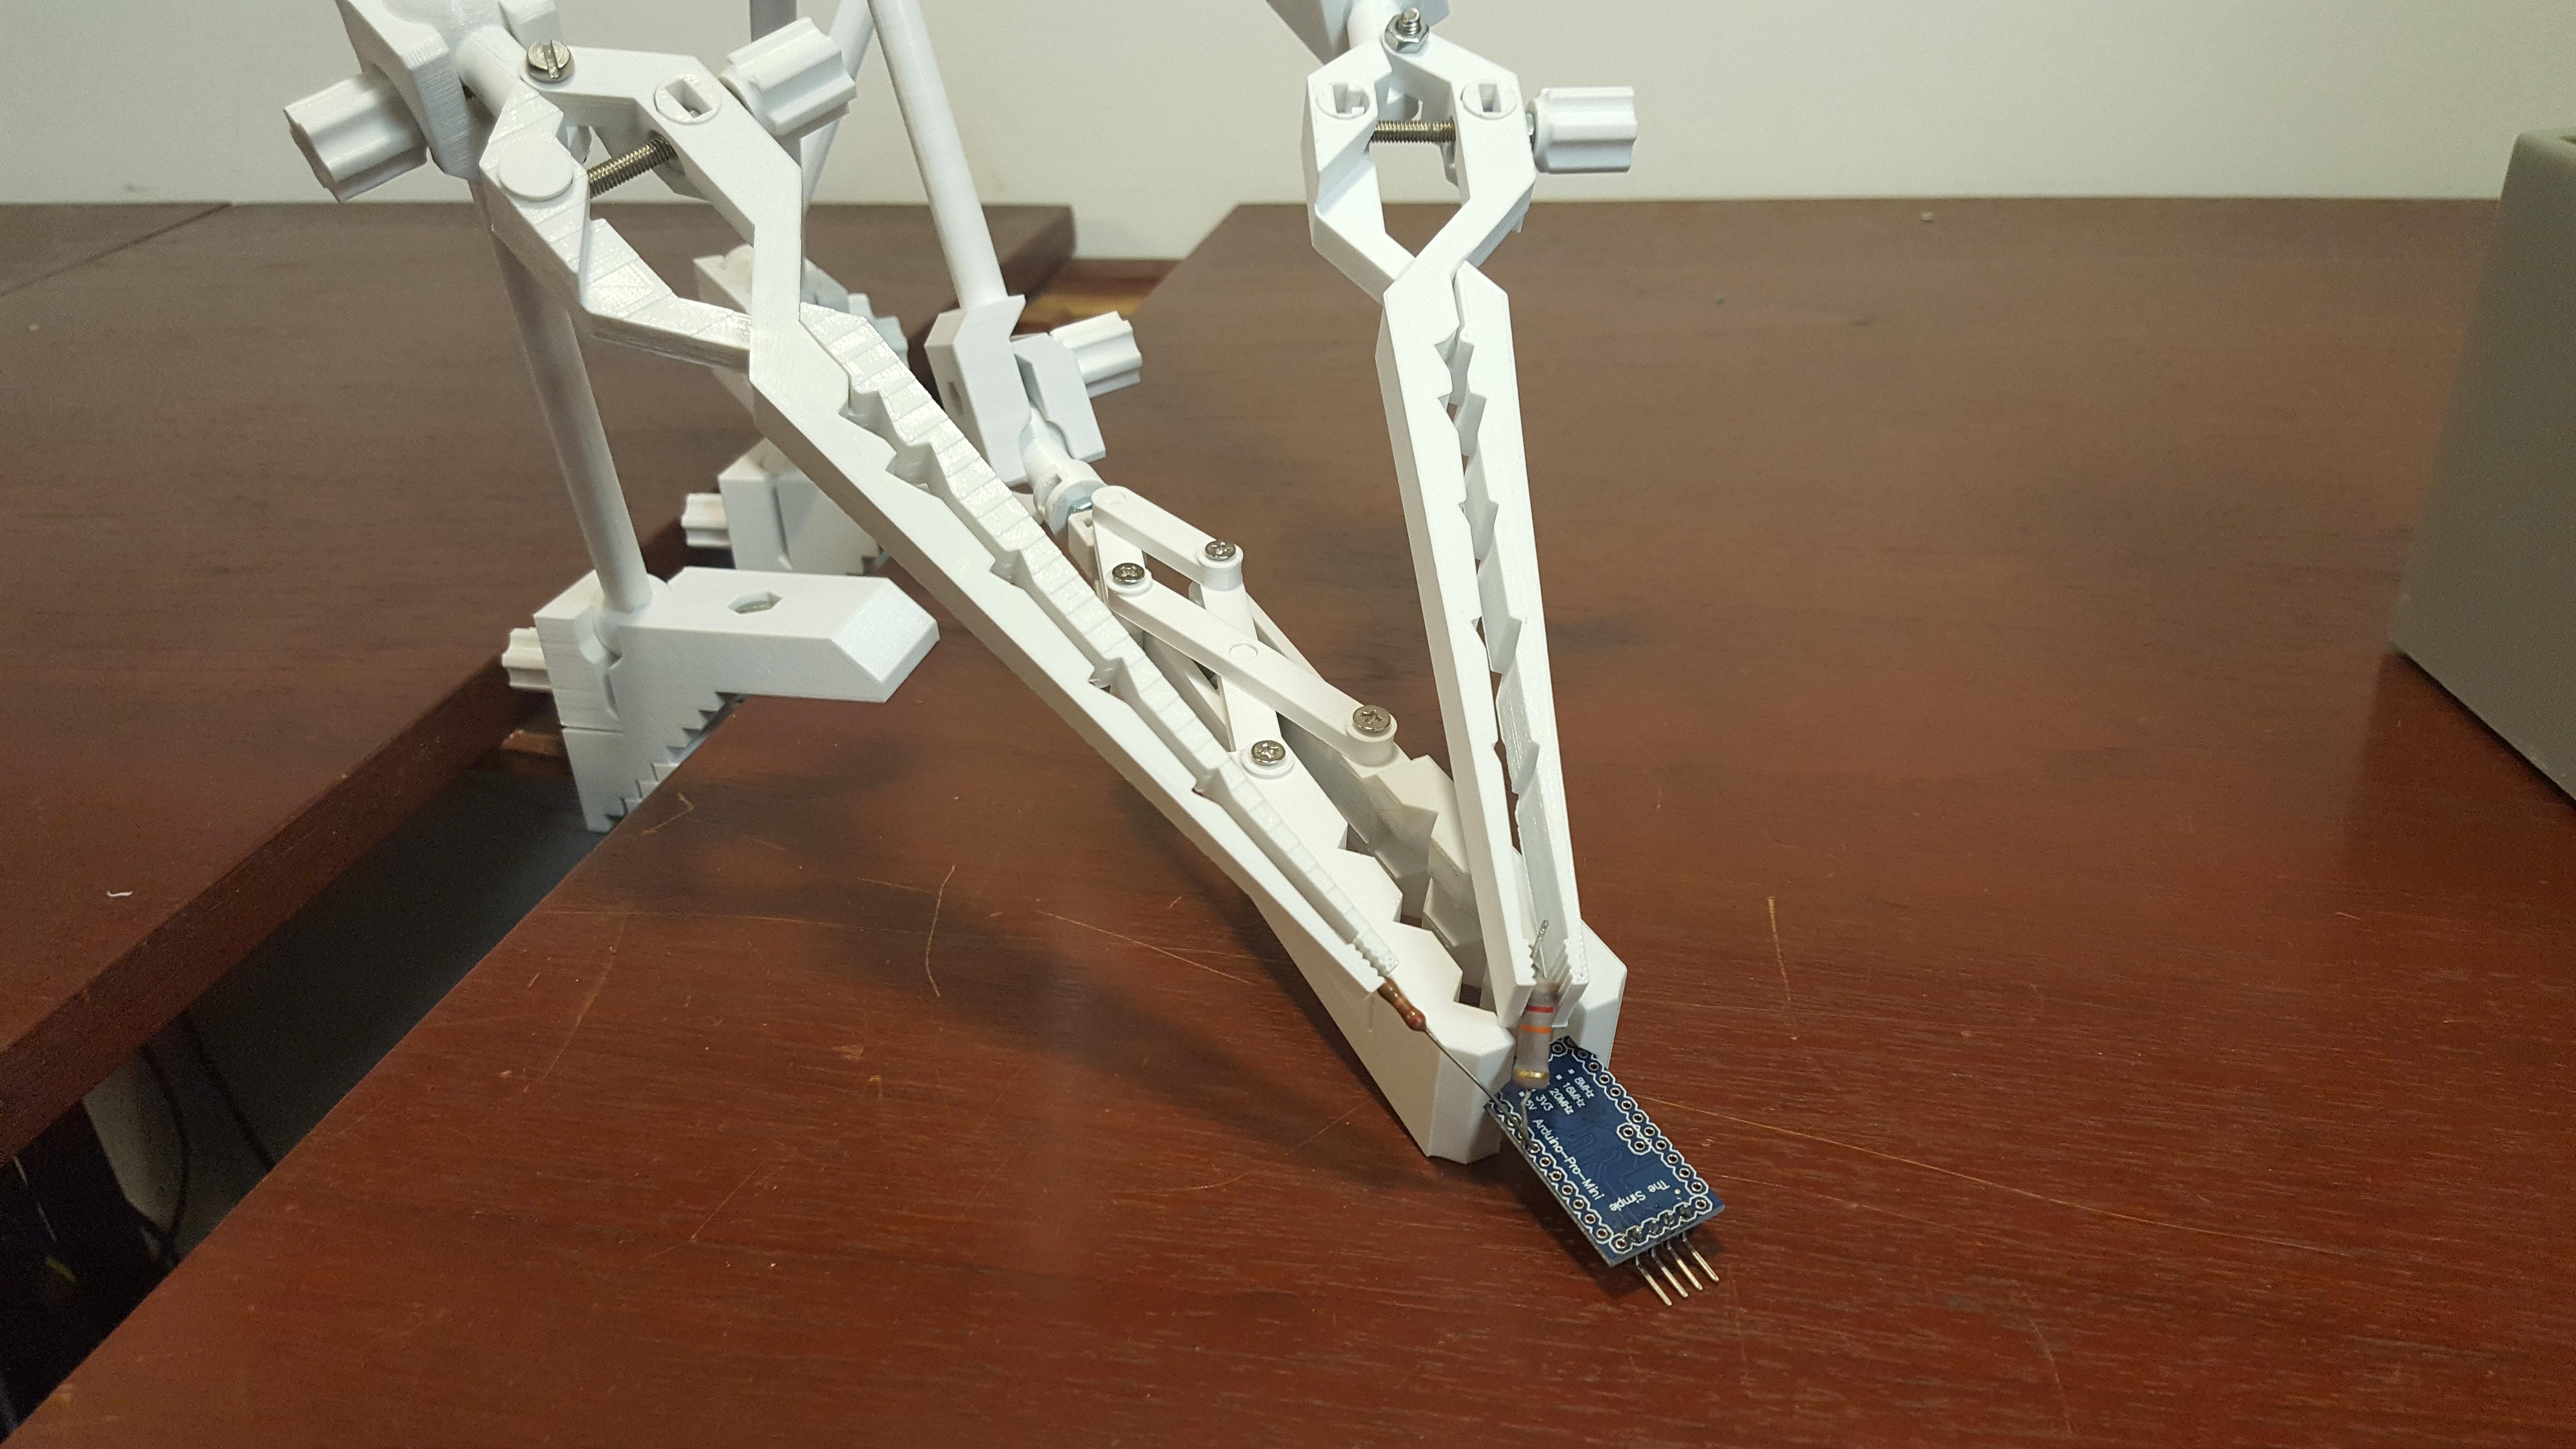 20190814_171715.jpg Download STL file Universal Arm • 3D printable template, Job